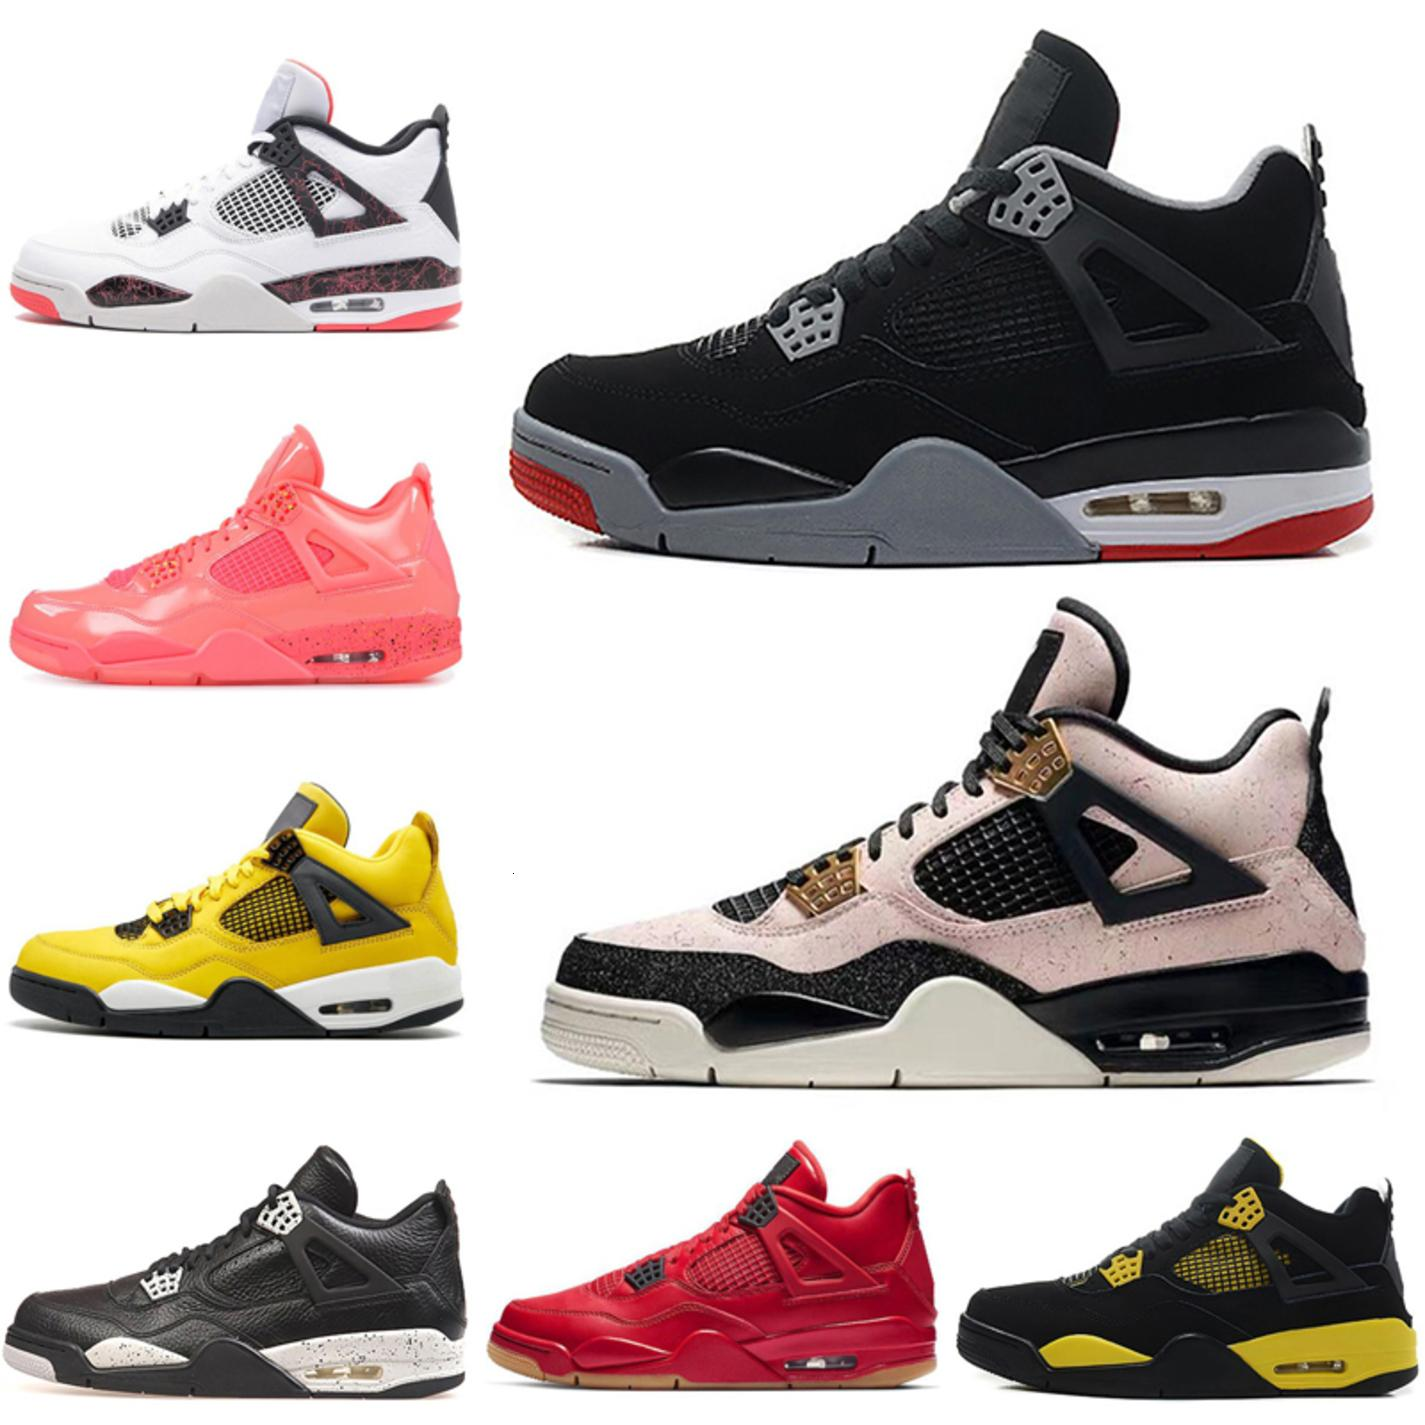 Какие баскетбольные ботинки CORMED 4S 4S 4 FIBA Silt Red Tattoo Raptors Laser Black jum Mens Trainers Athletics Sports Reakers 7-13